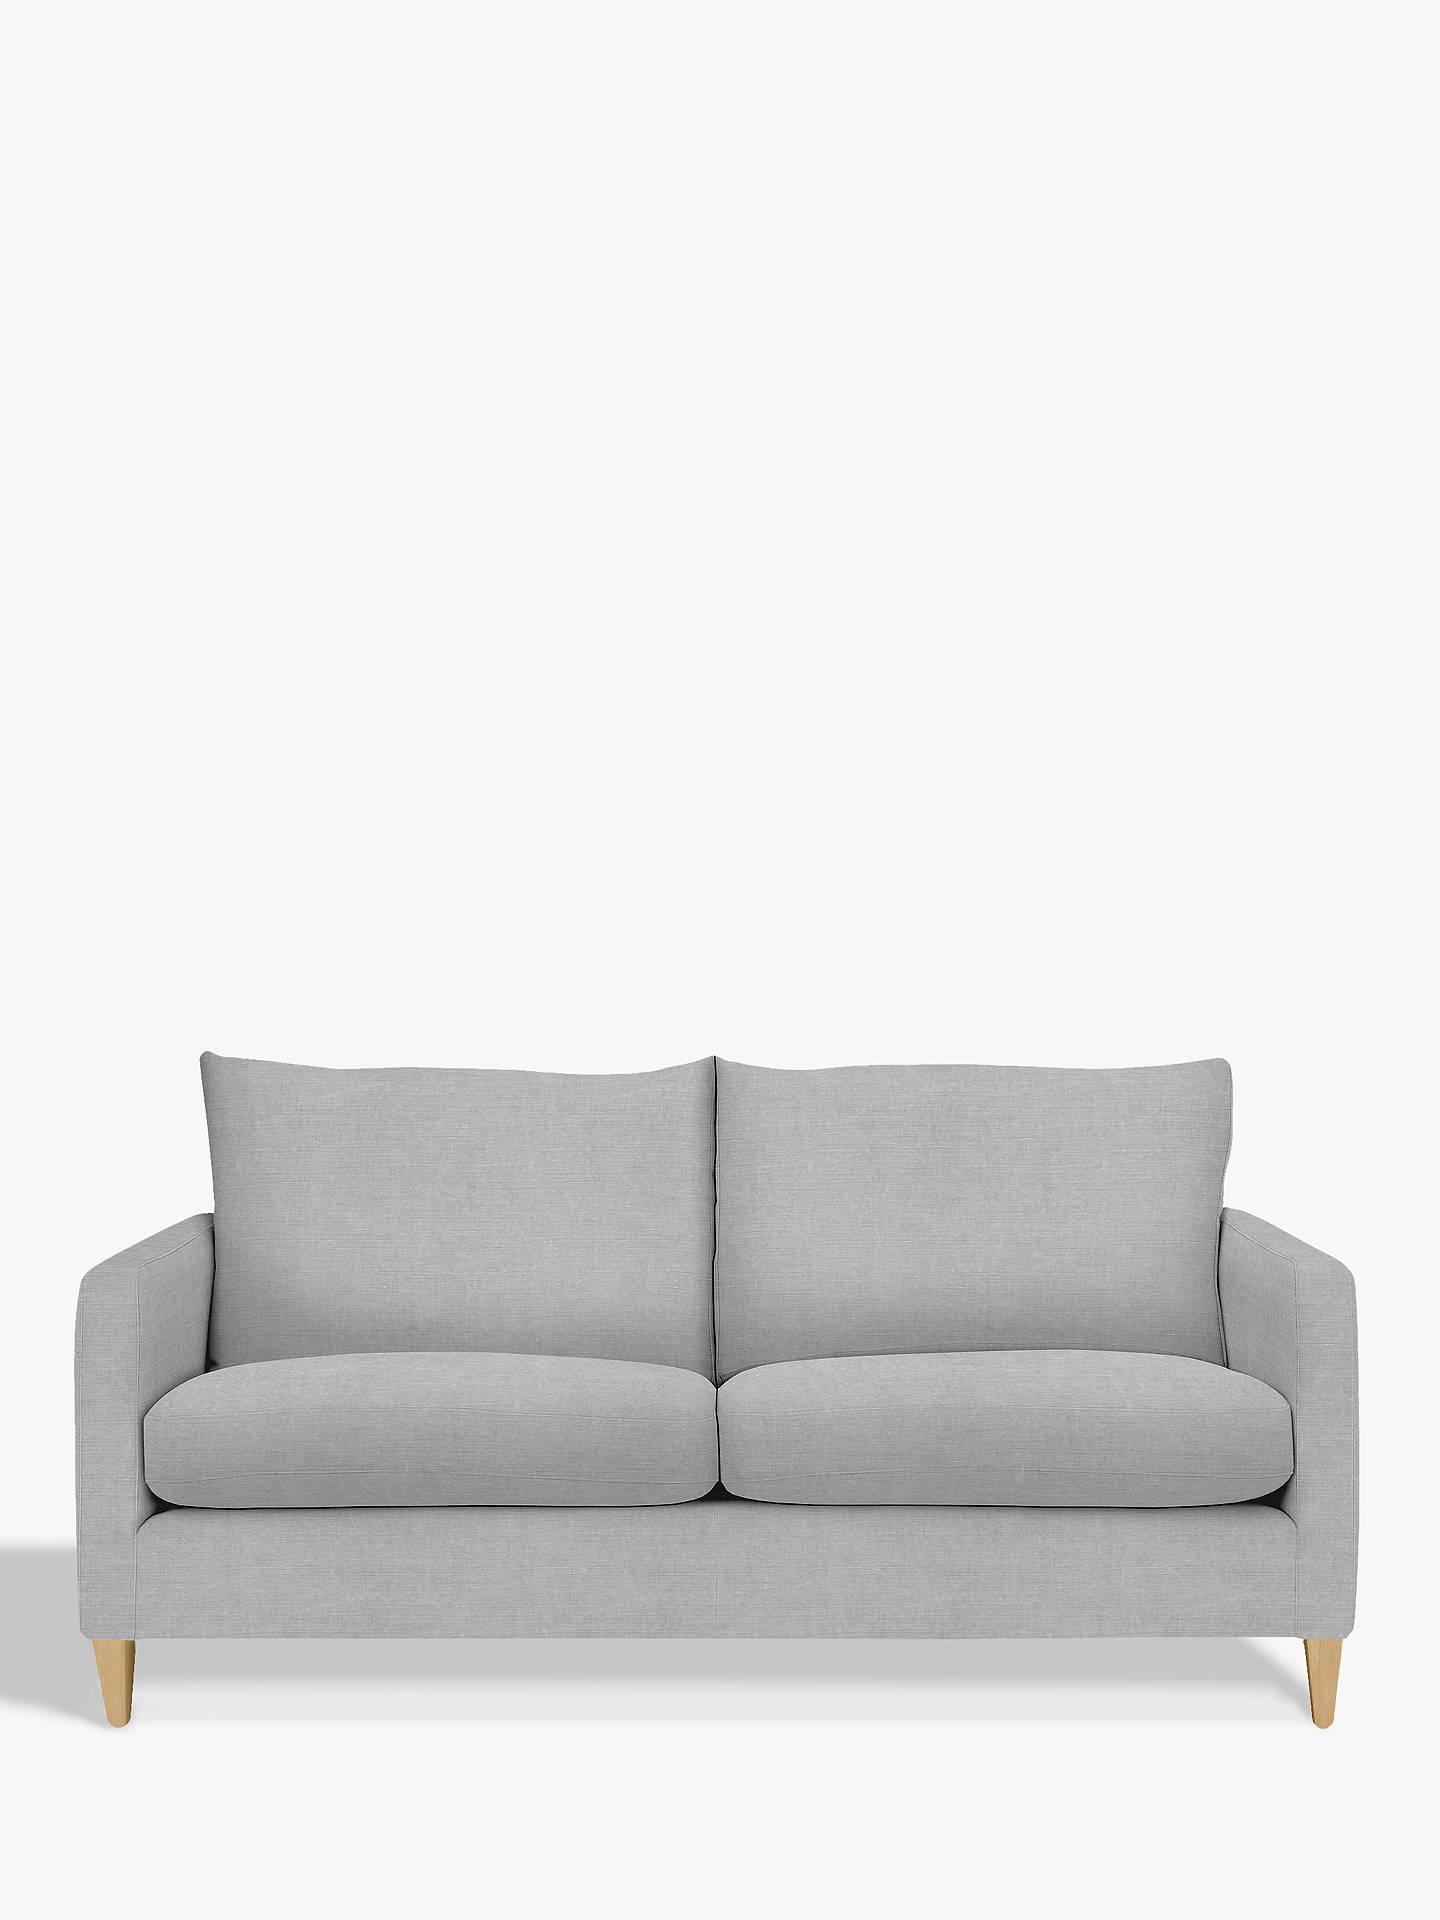 Magnificent John Lewis Partners Bailey Small 2 Seater Sofa Creativecarmelina Interior Chair Design Creativecarmelinacom